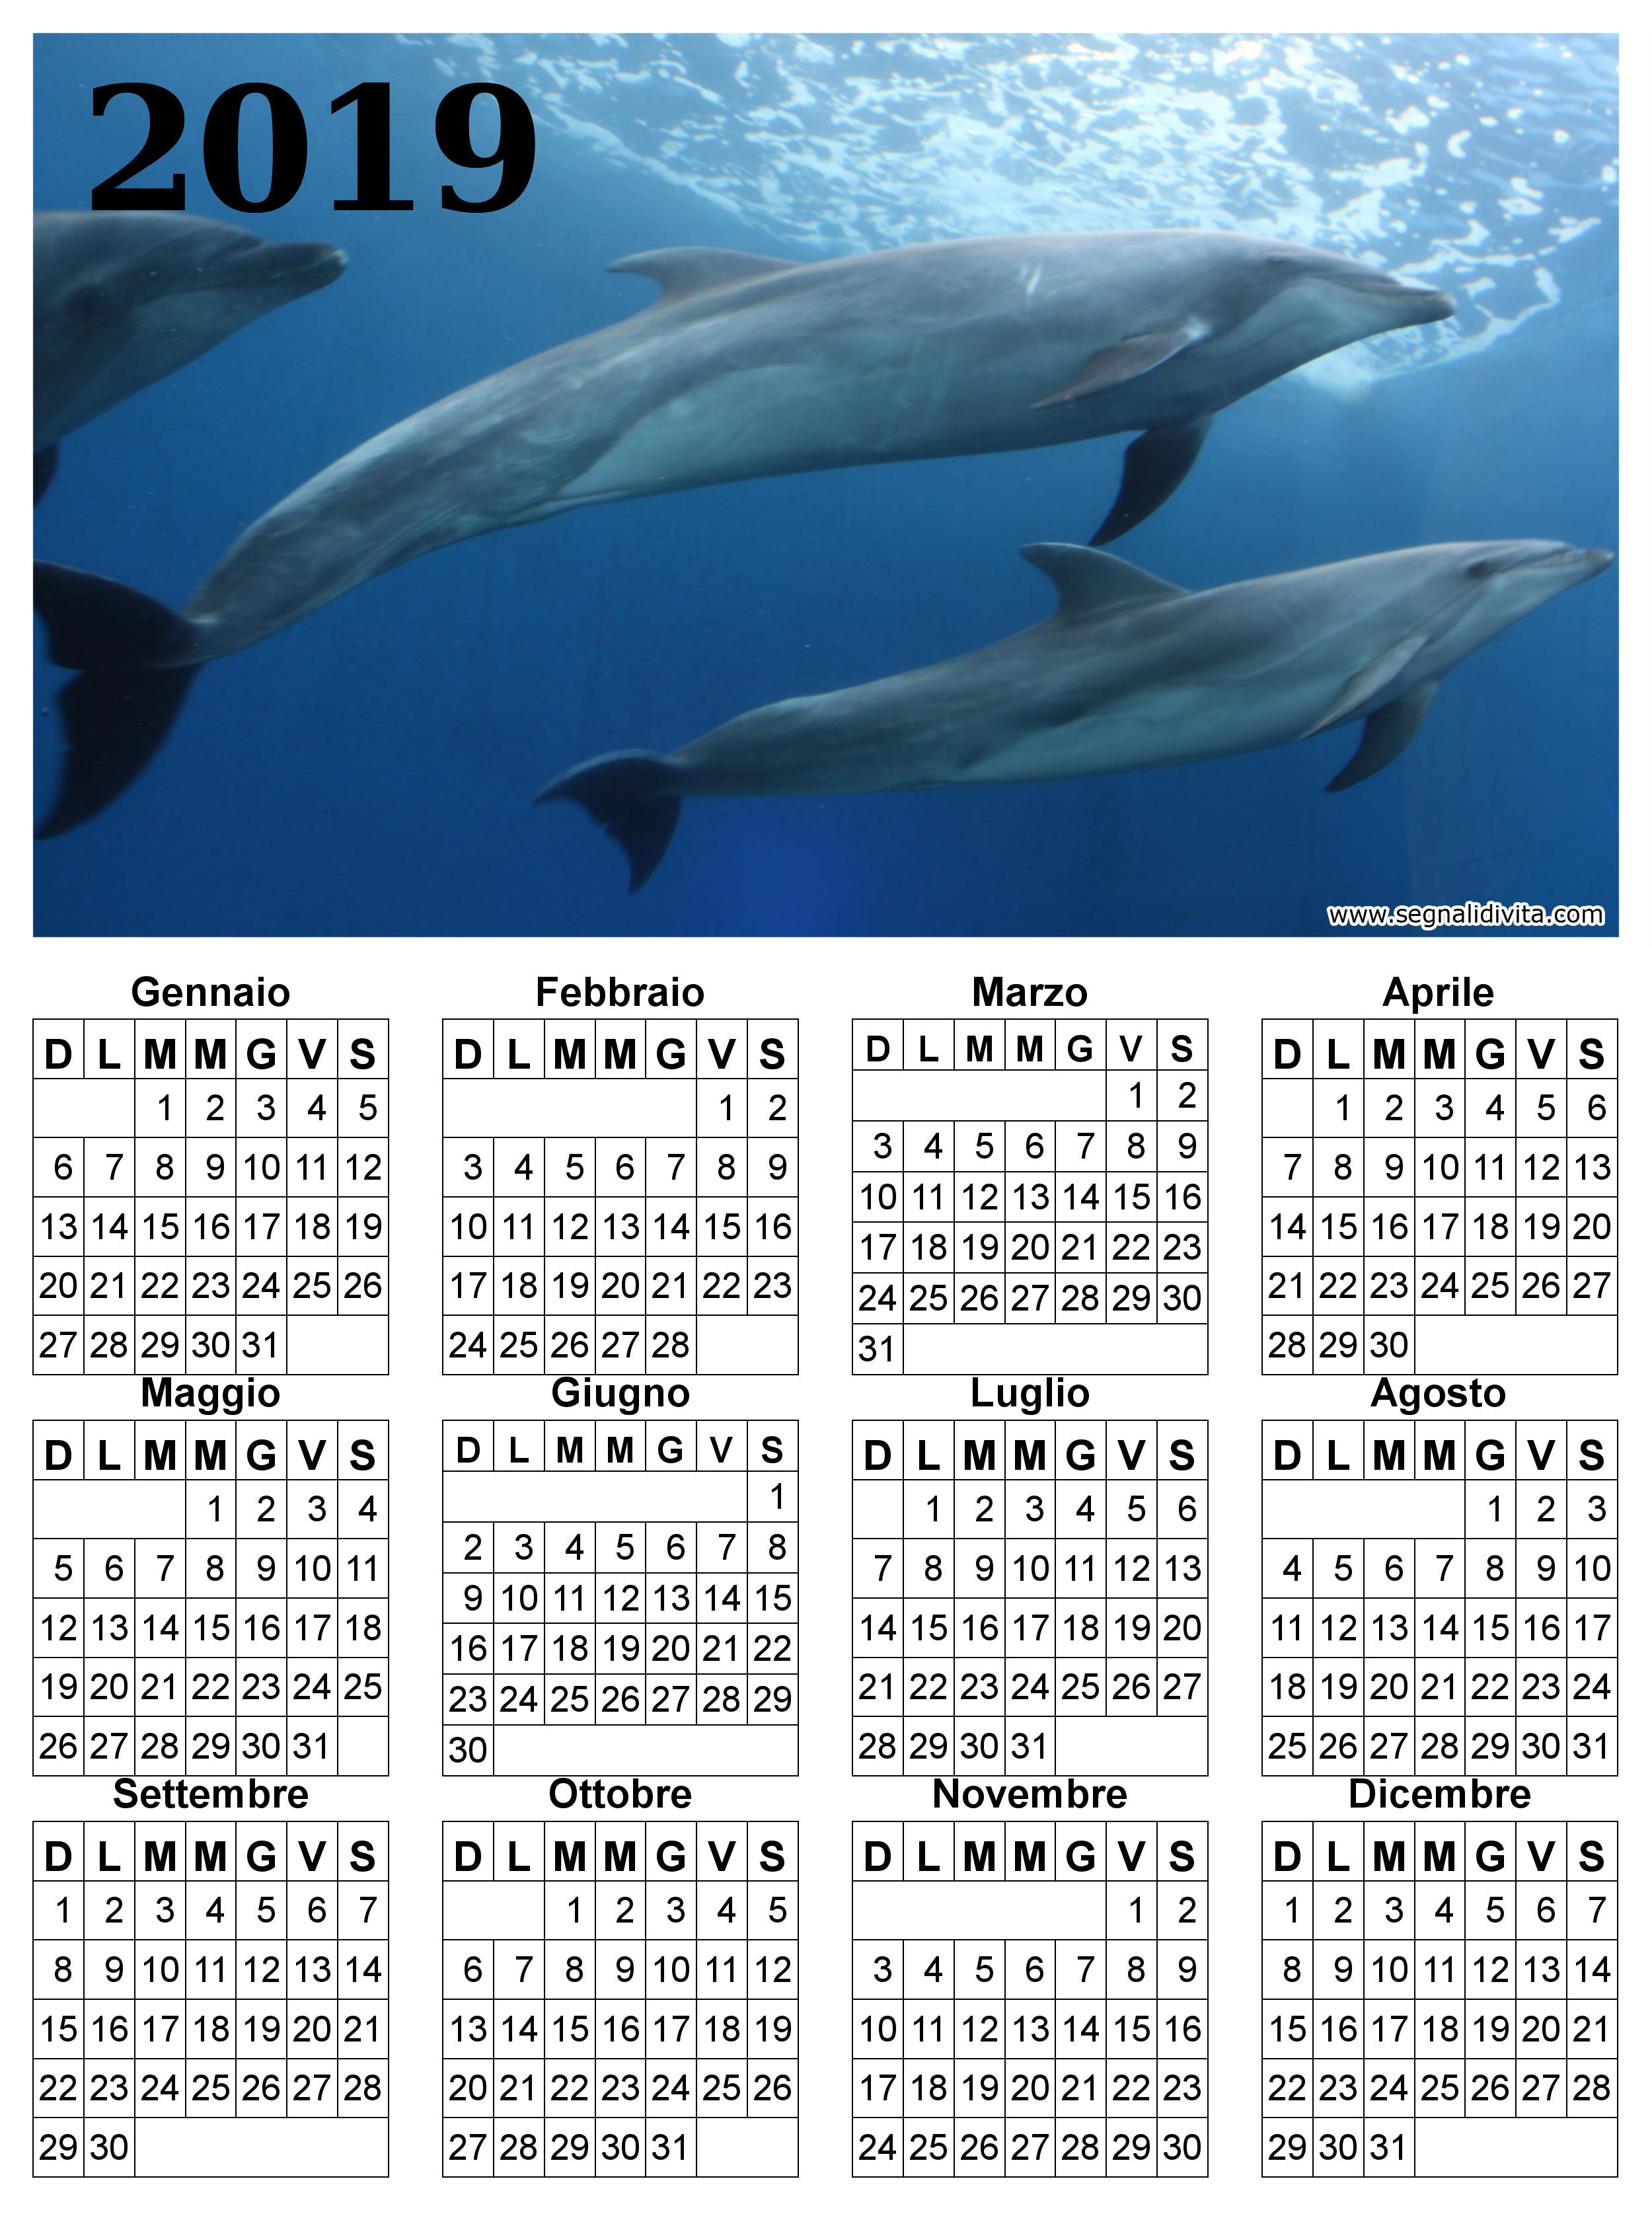 Calendario delfini del 2019